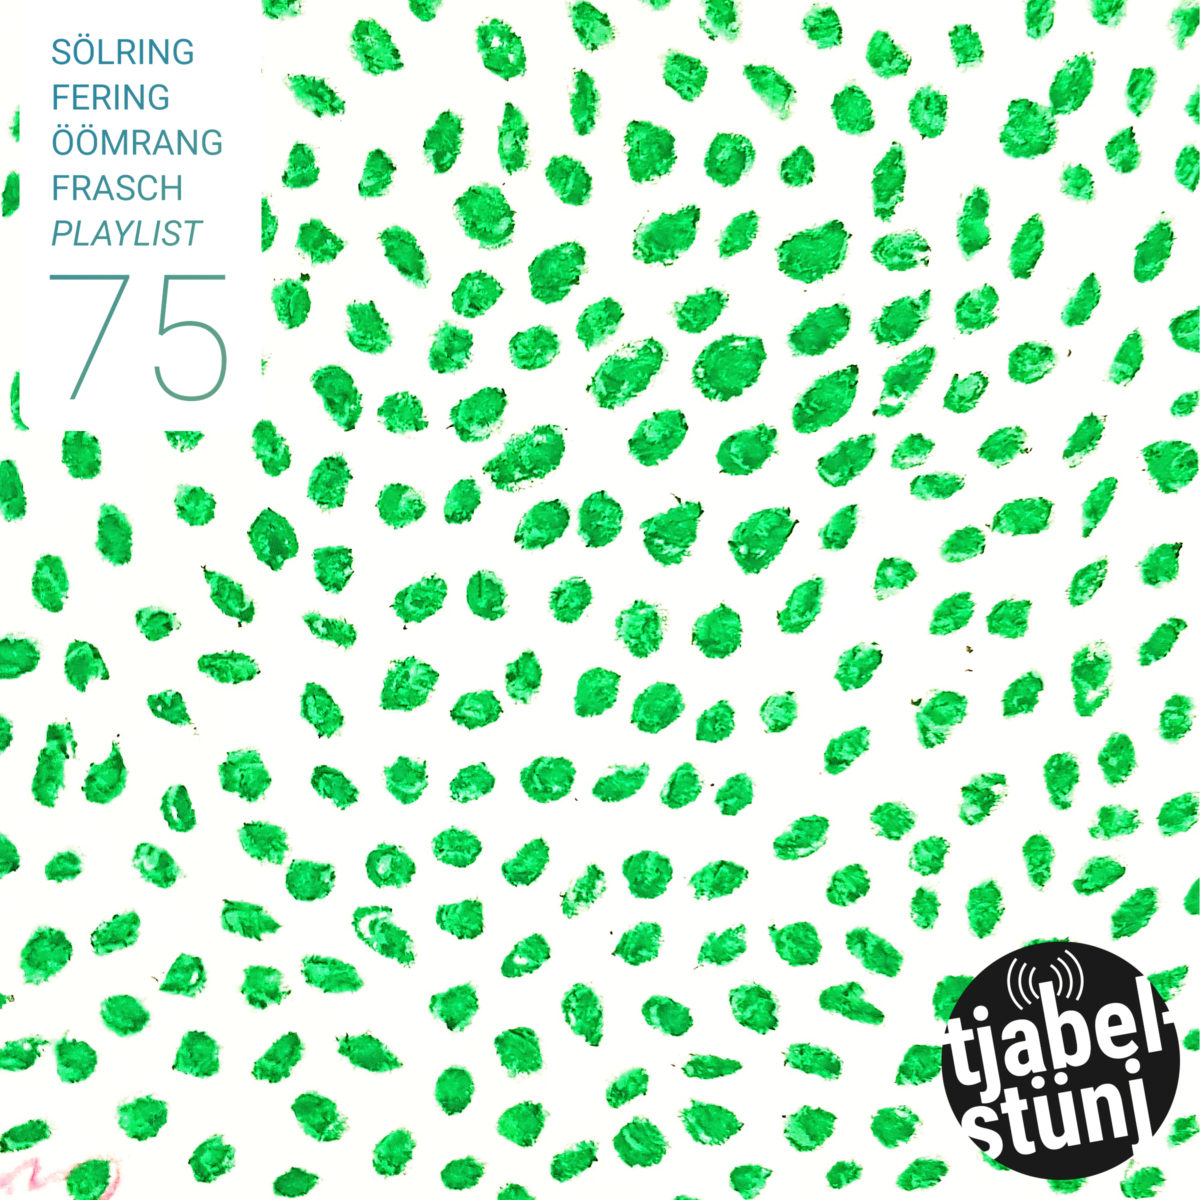 Playlist #75